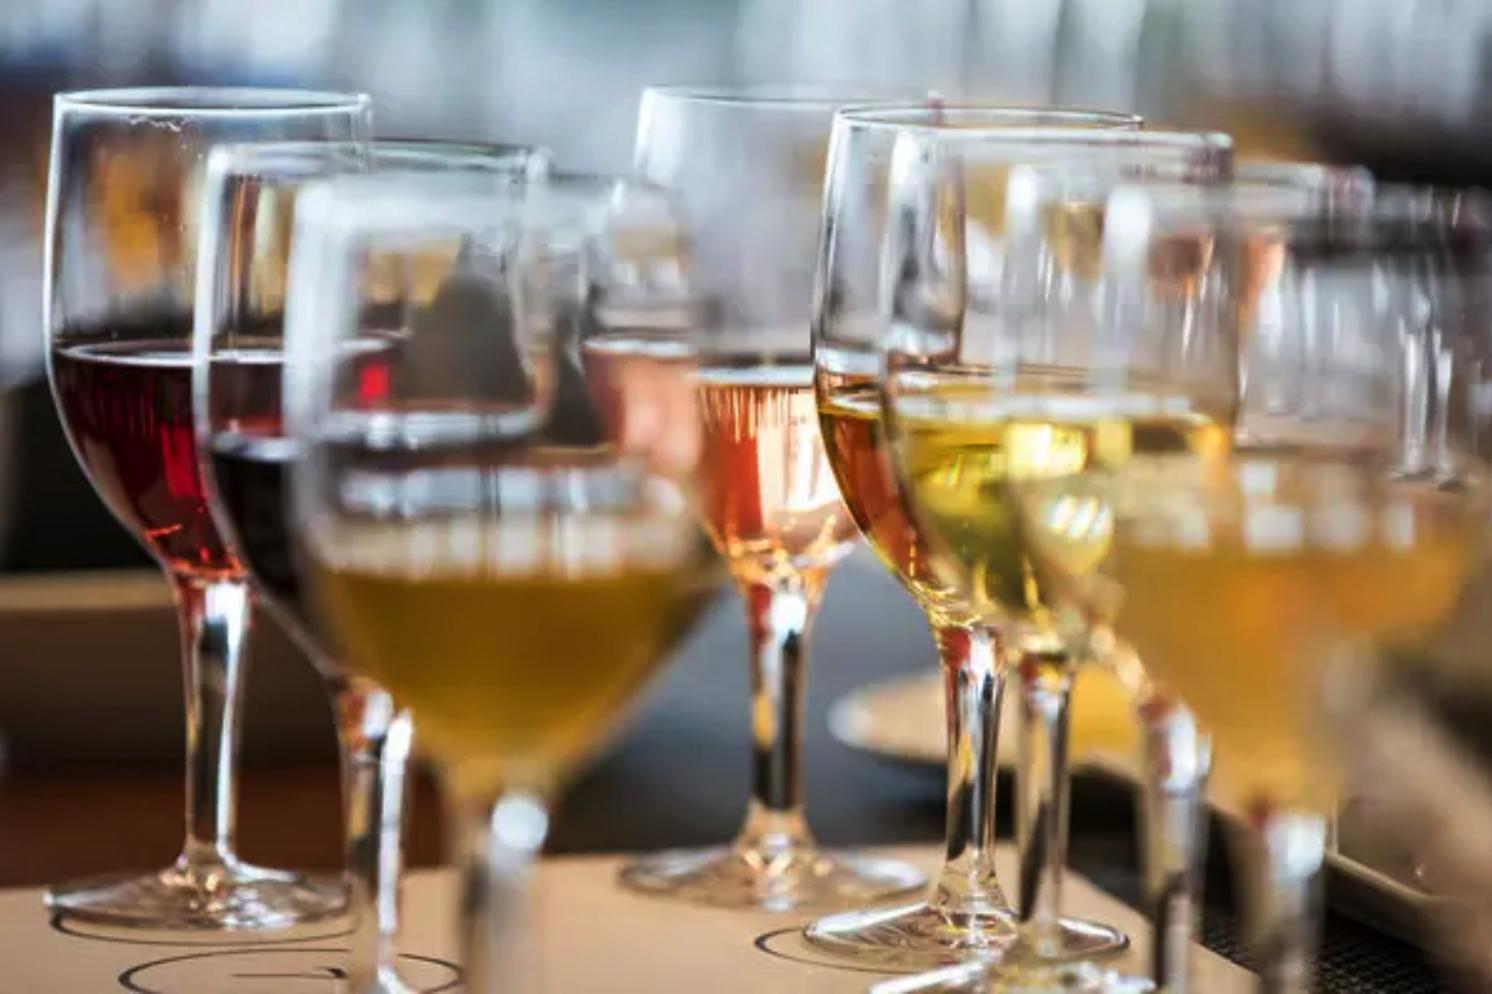 Alcohol - the Medium Used by Herodias to Murder John the Baptist